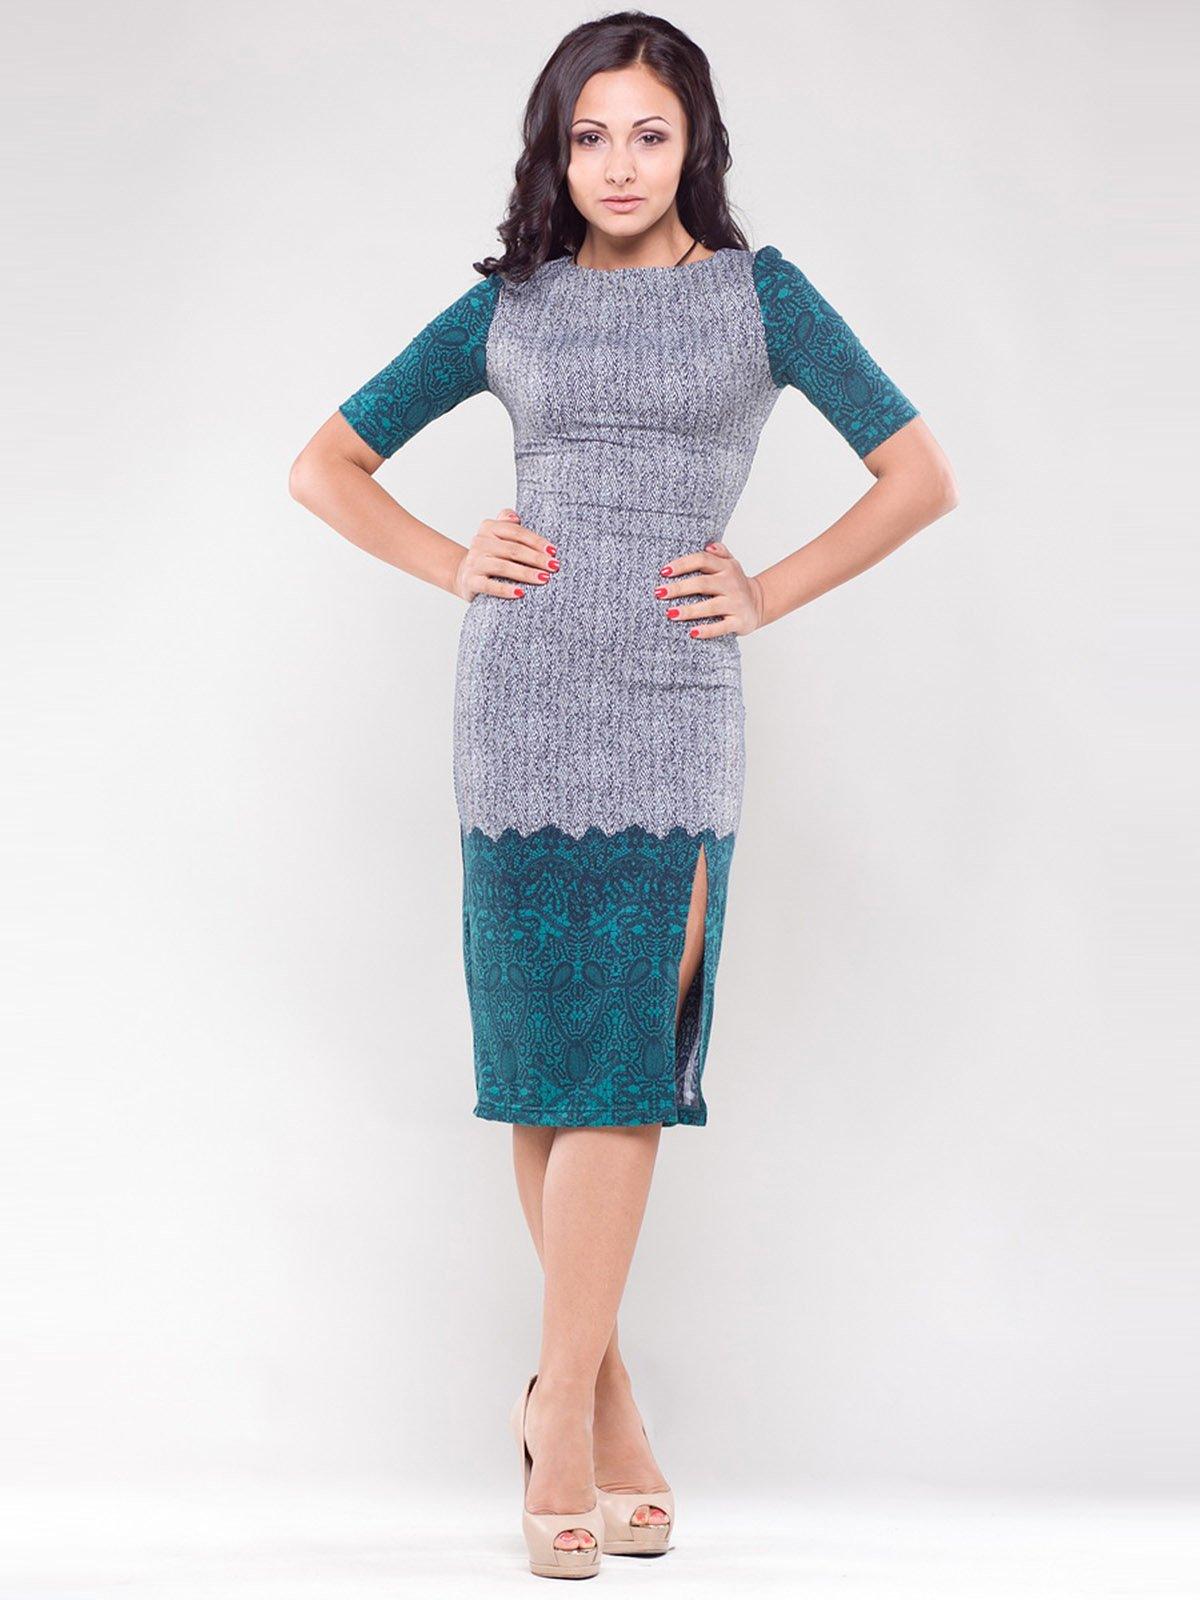 Сукня сіро-зелена у візерунок   1343792